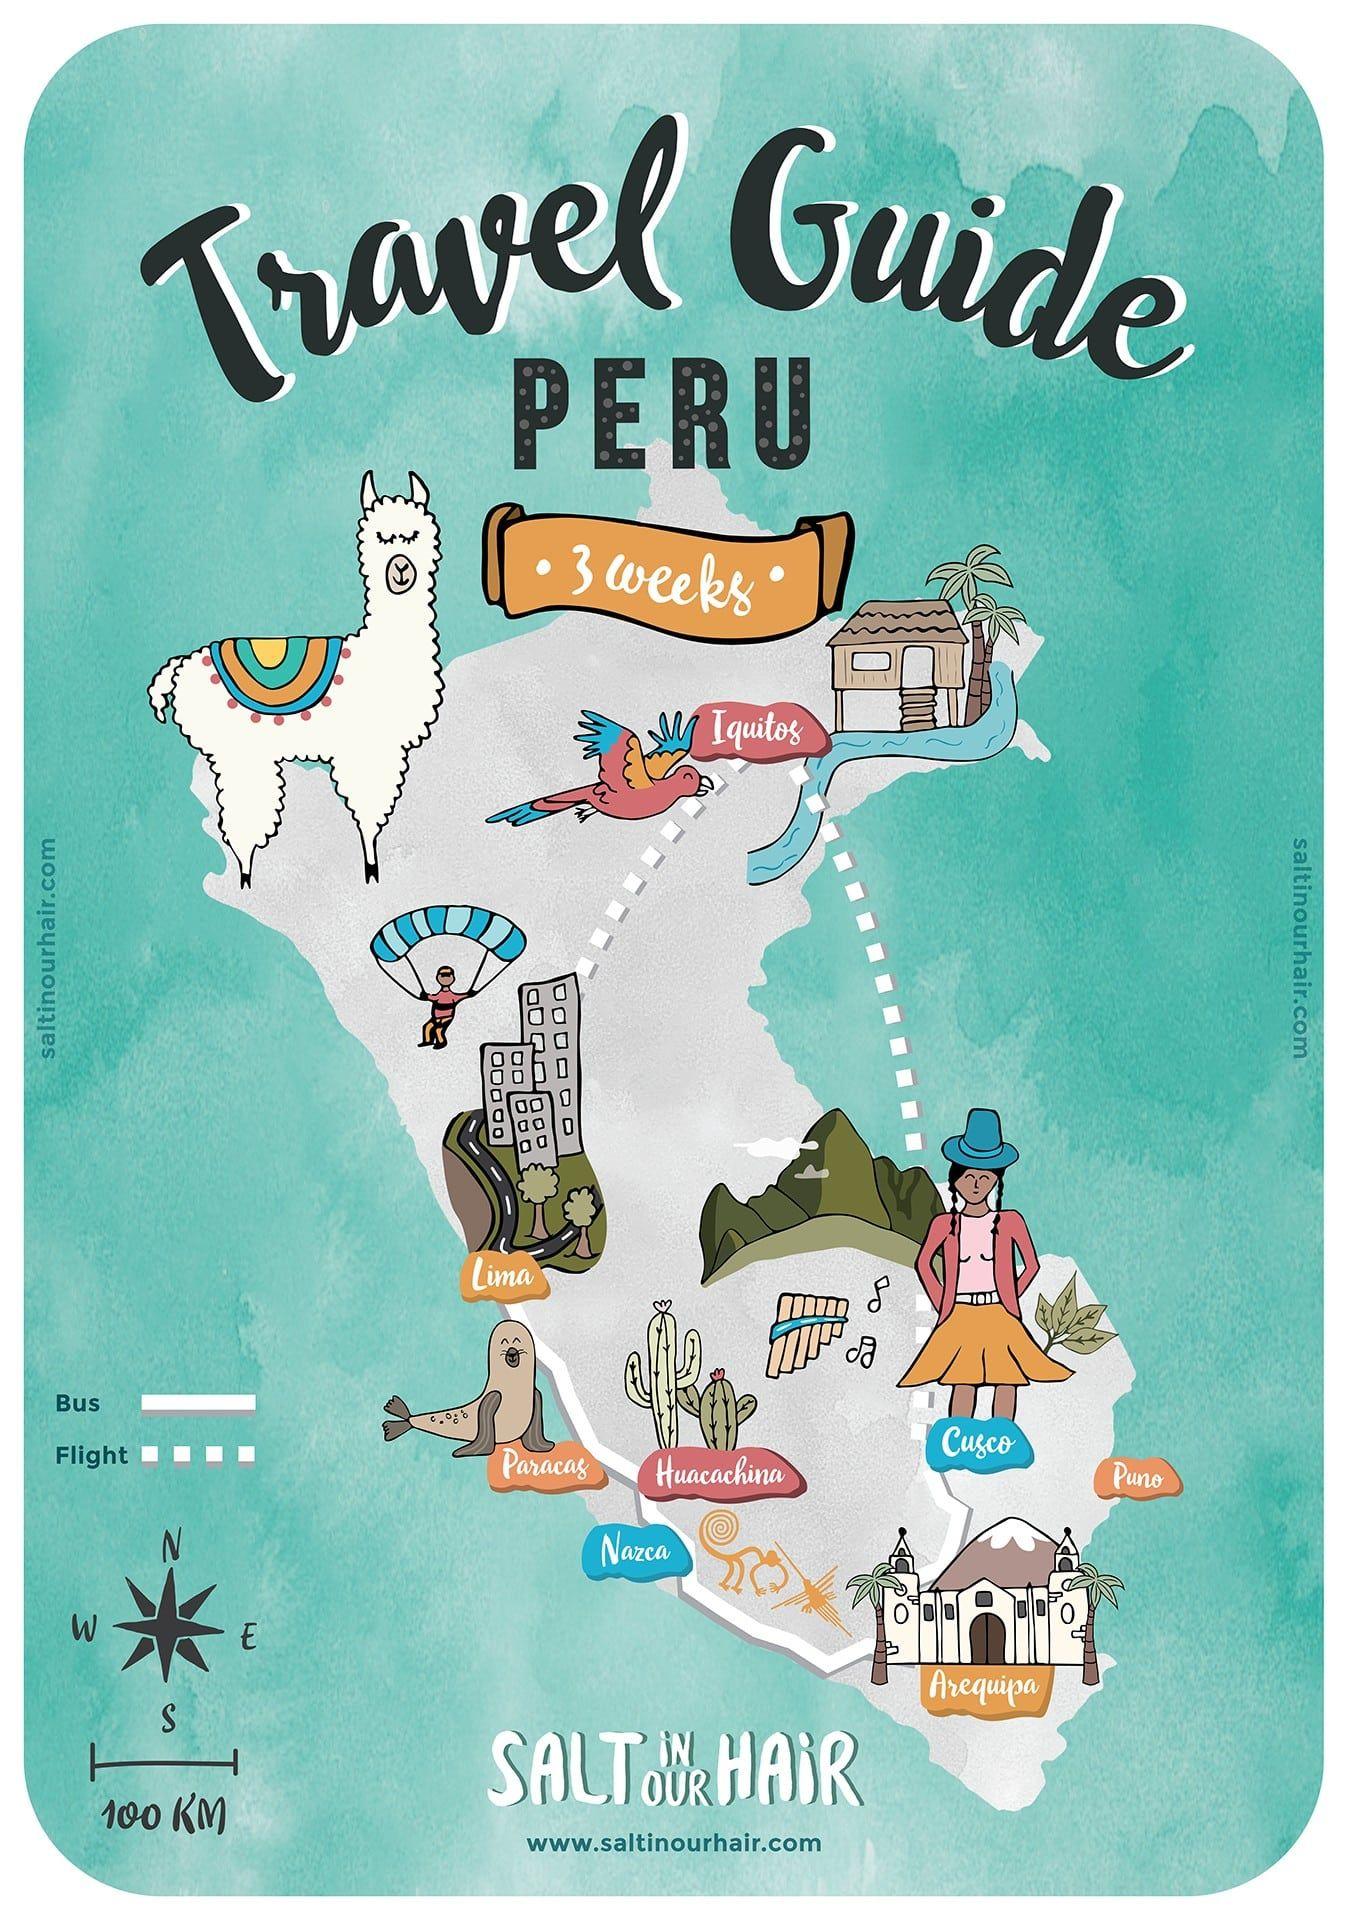 Peru Travel Guide: The Ultimate 3-week Peru Travel Itinerary